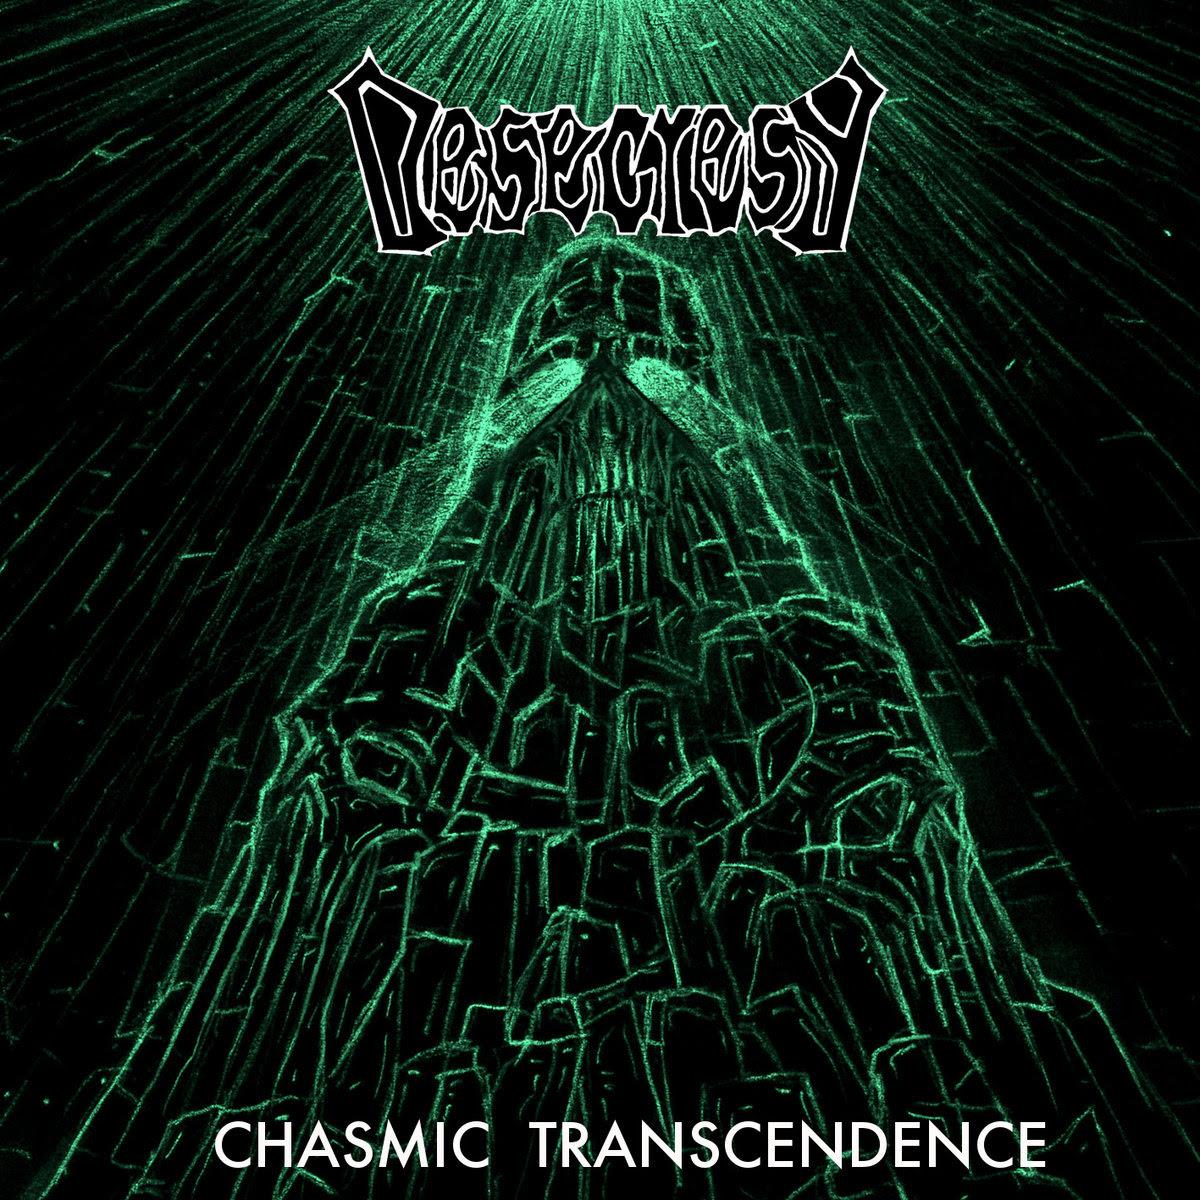 Desecresy - Chasmic Transcendence (2014)